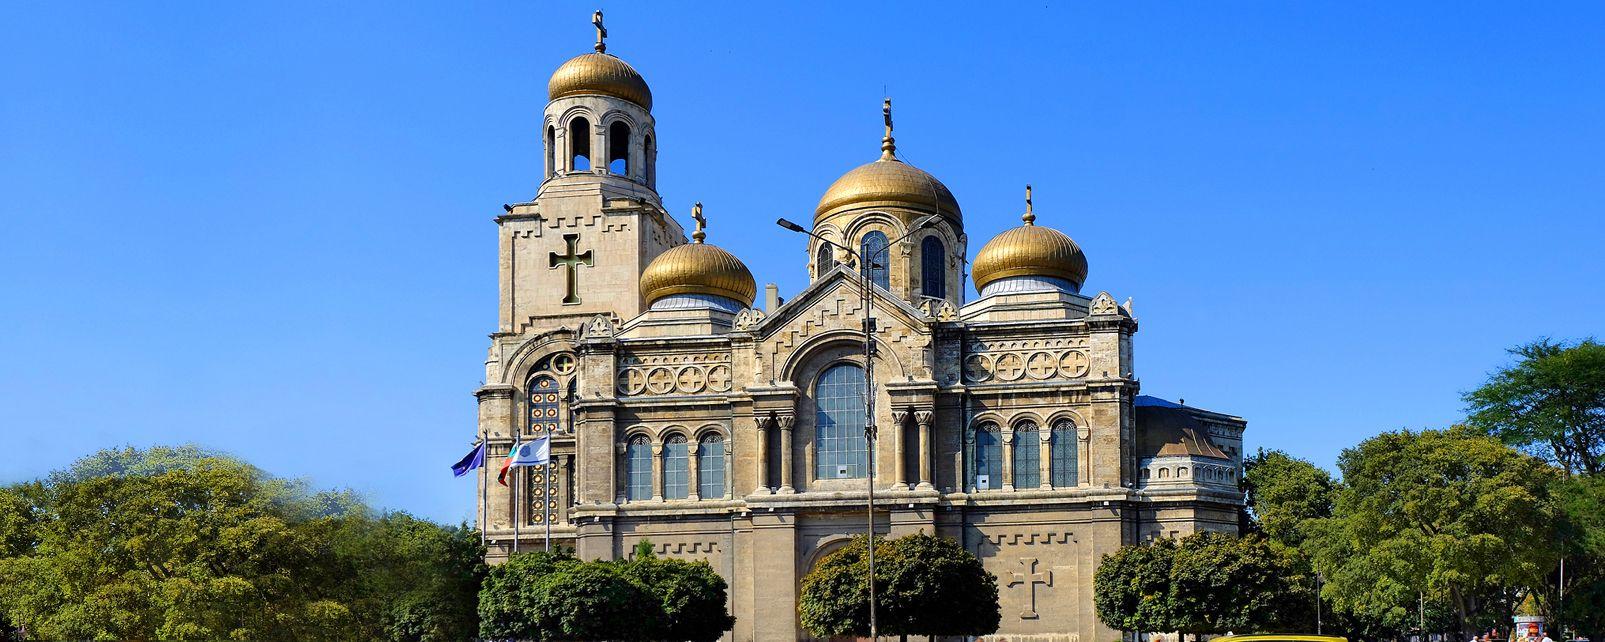 Les monuments, Cathédrale, Europe, Bulgarie, Varna, religion, christianisme, Assomption